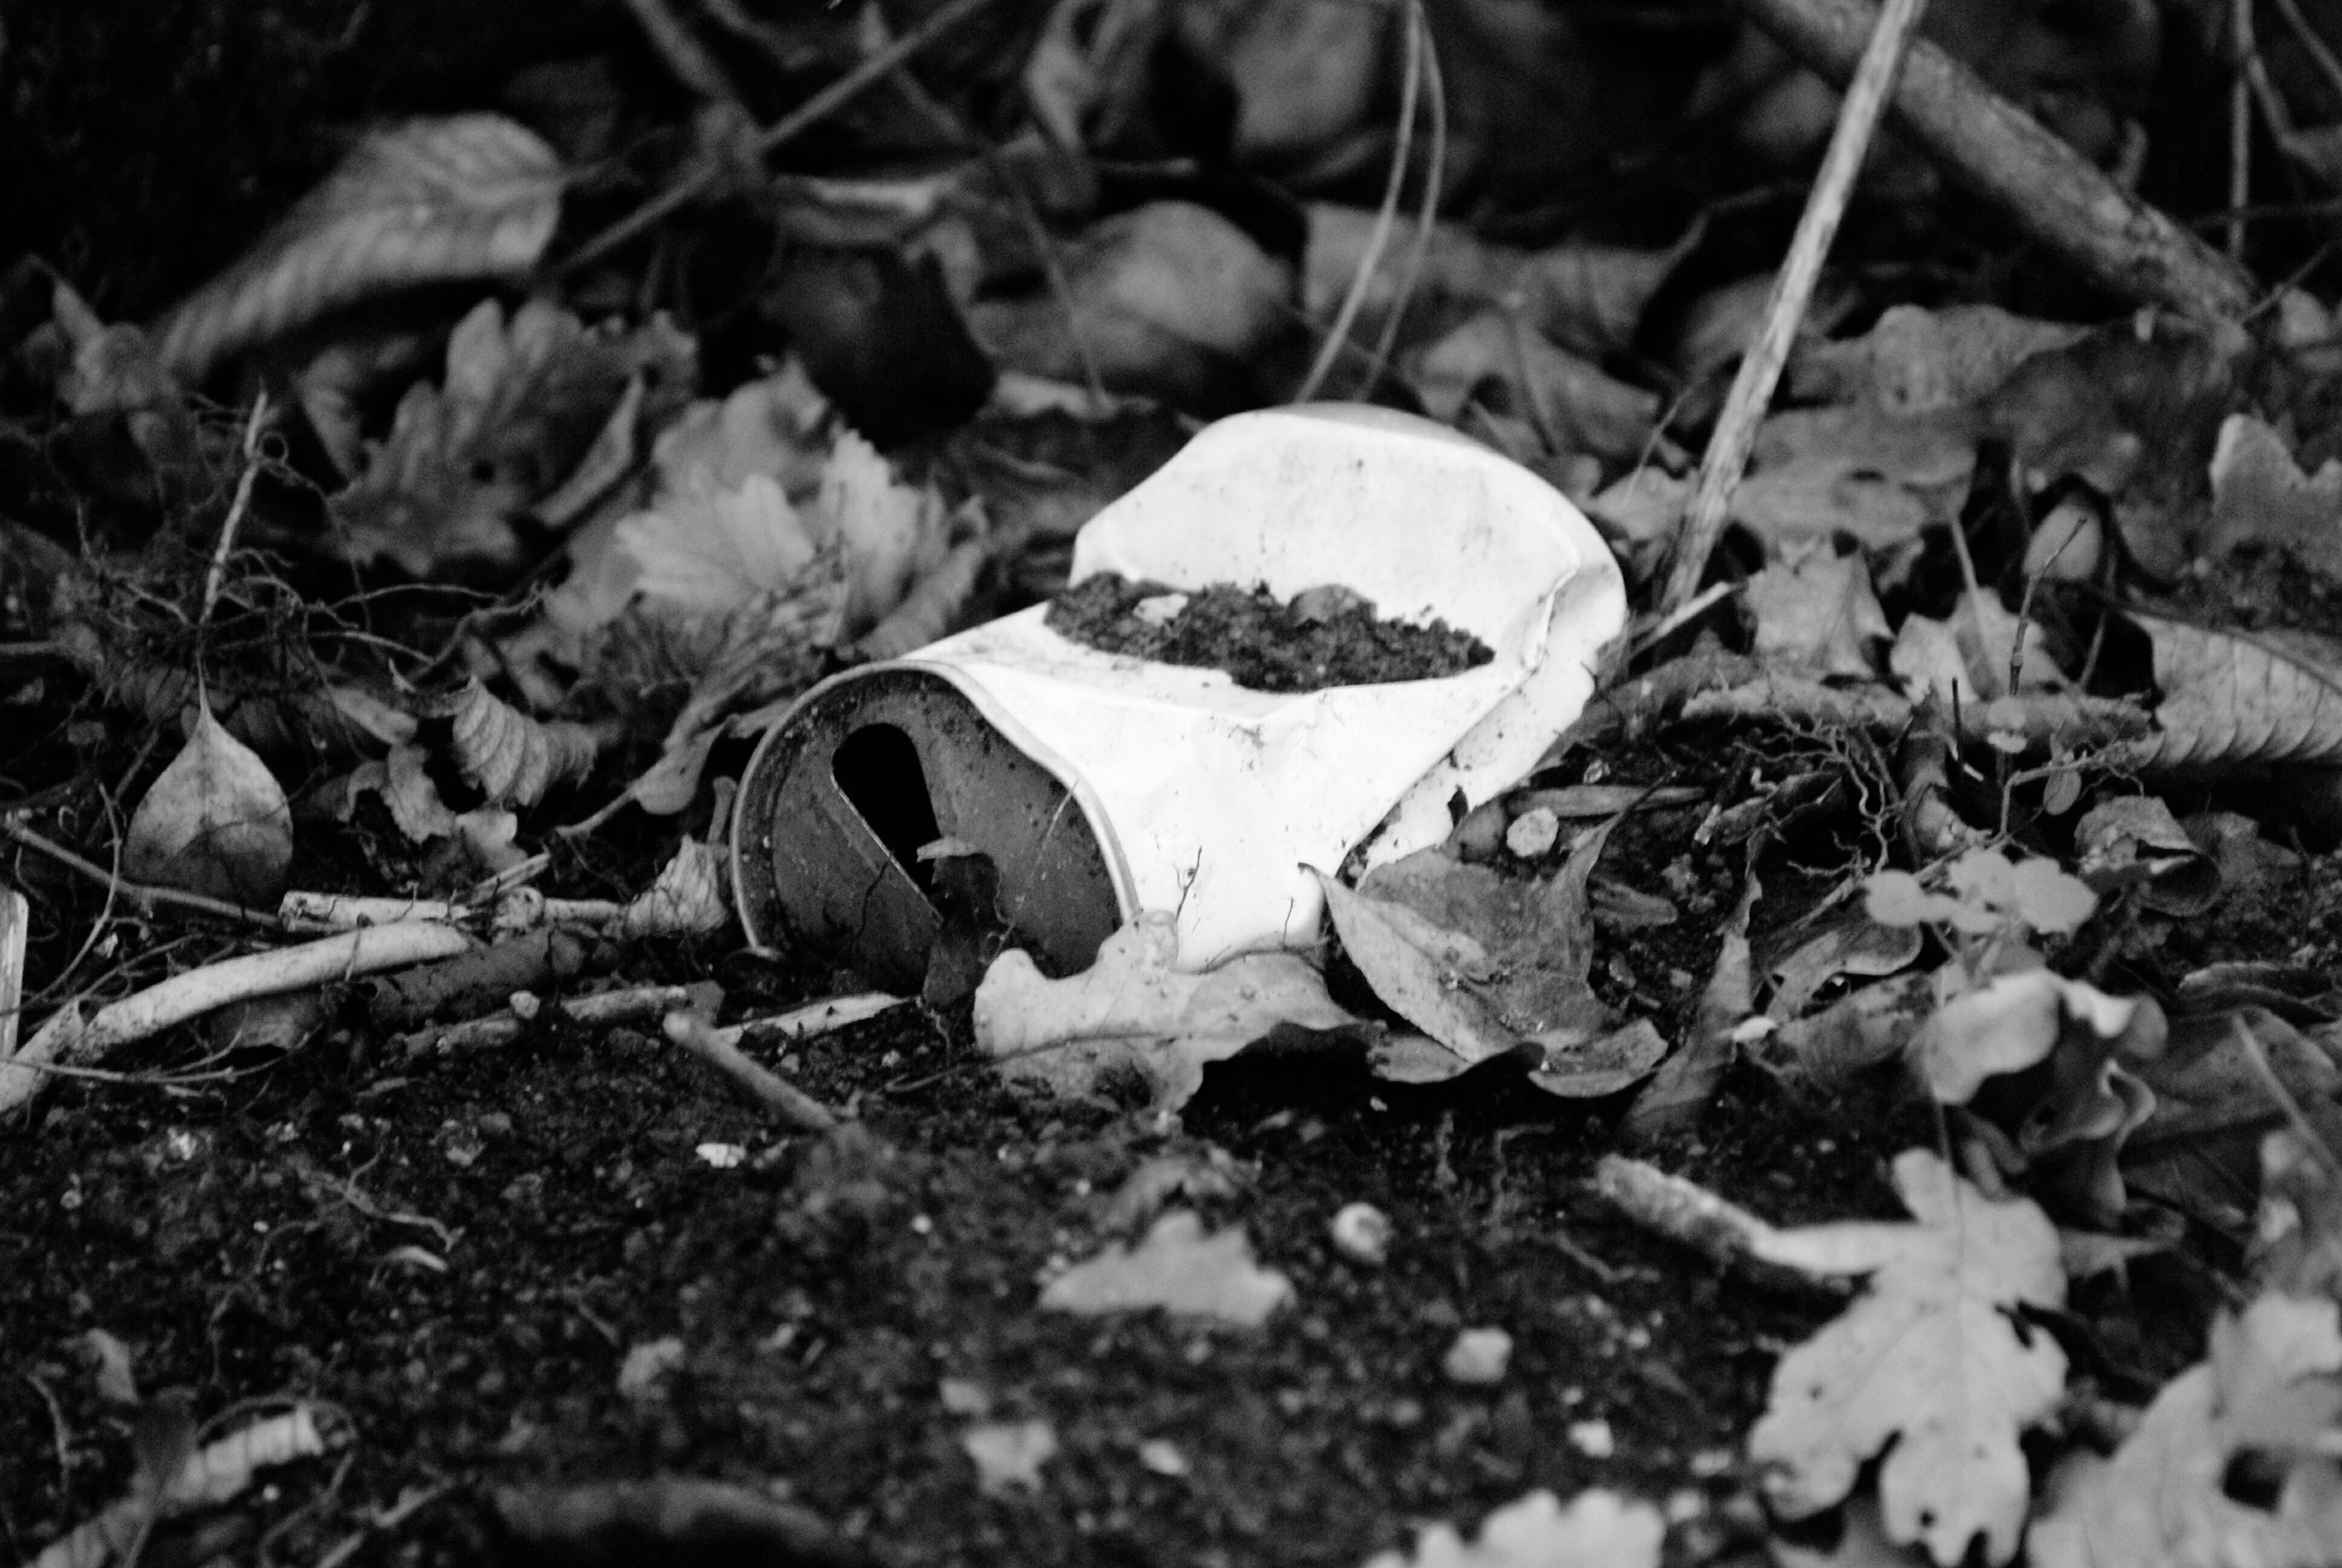 Reflex Can Leafs Abandonedcan Abandoned Can Abandoned Old Usata Schiacciata Foglie Abbandonata Vecchia Lattina Black'n'white  Blackandwhite Black'n'whitephotography Black'n'white Photography Black And White Black & White Blackandwhite Photography Black&white Black And White Photography Blackandwhitephotography